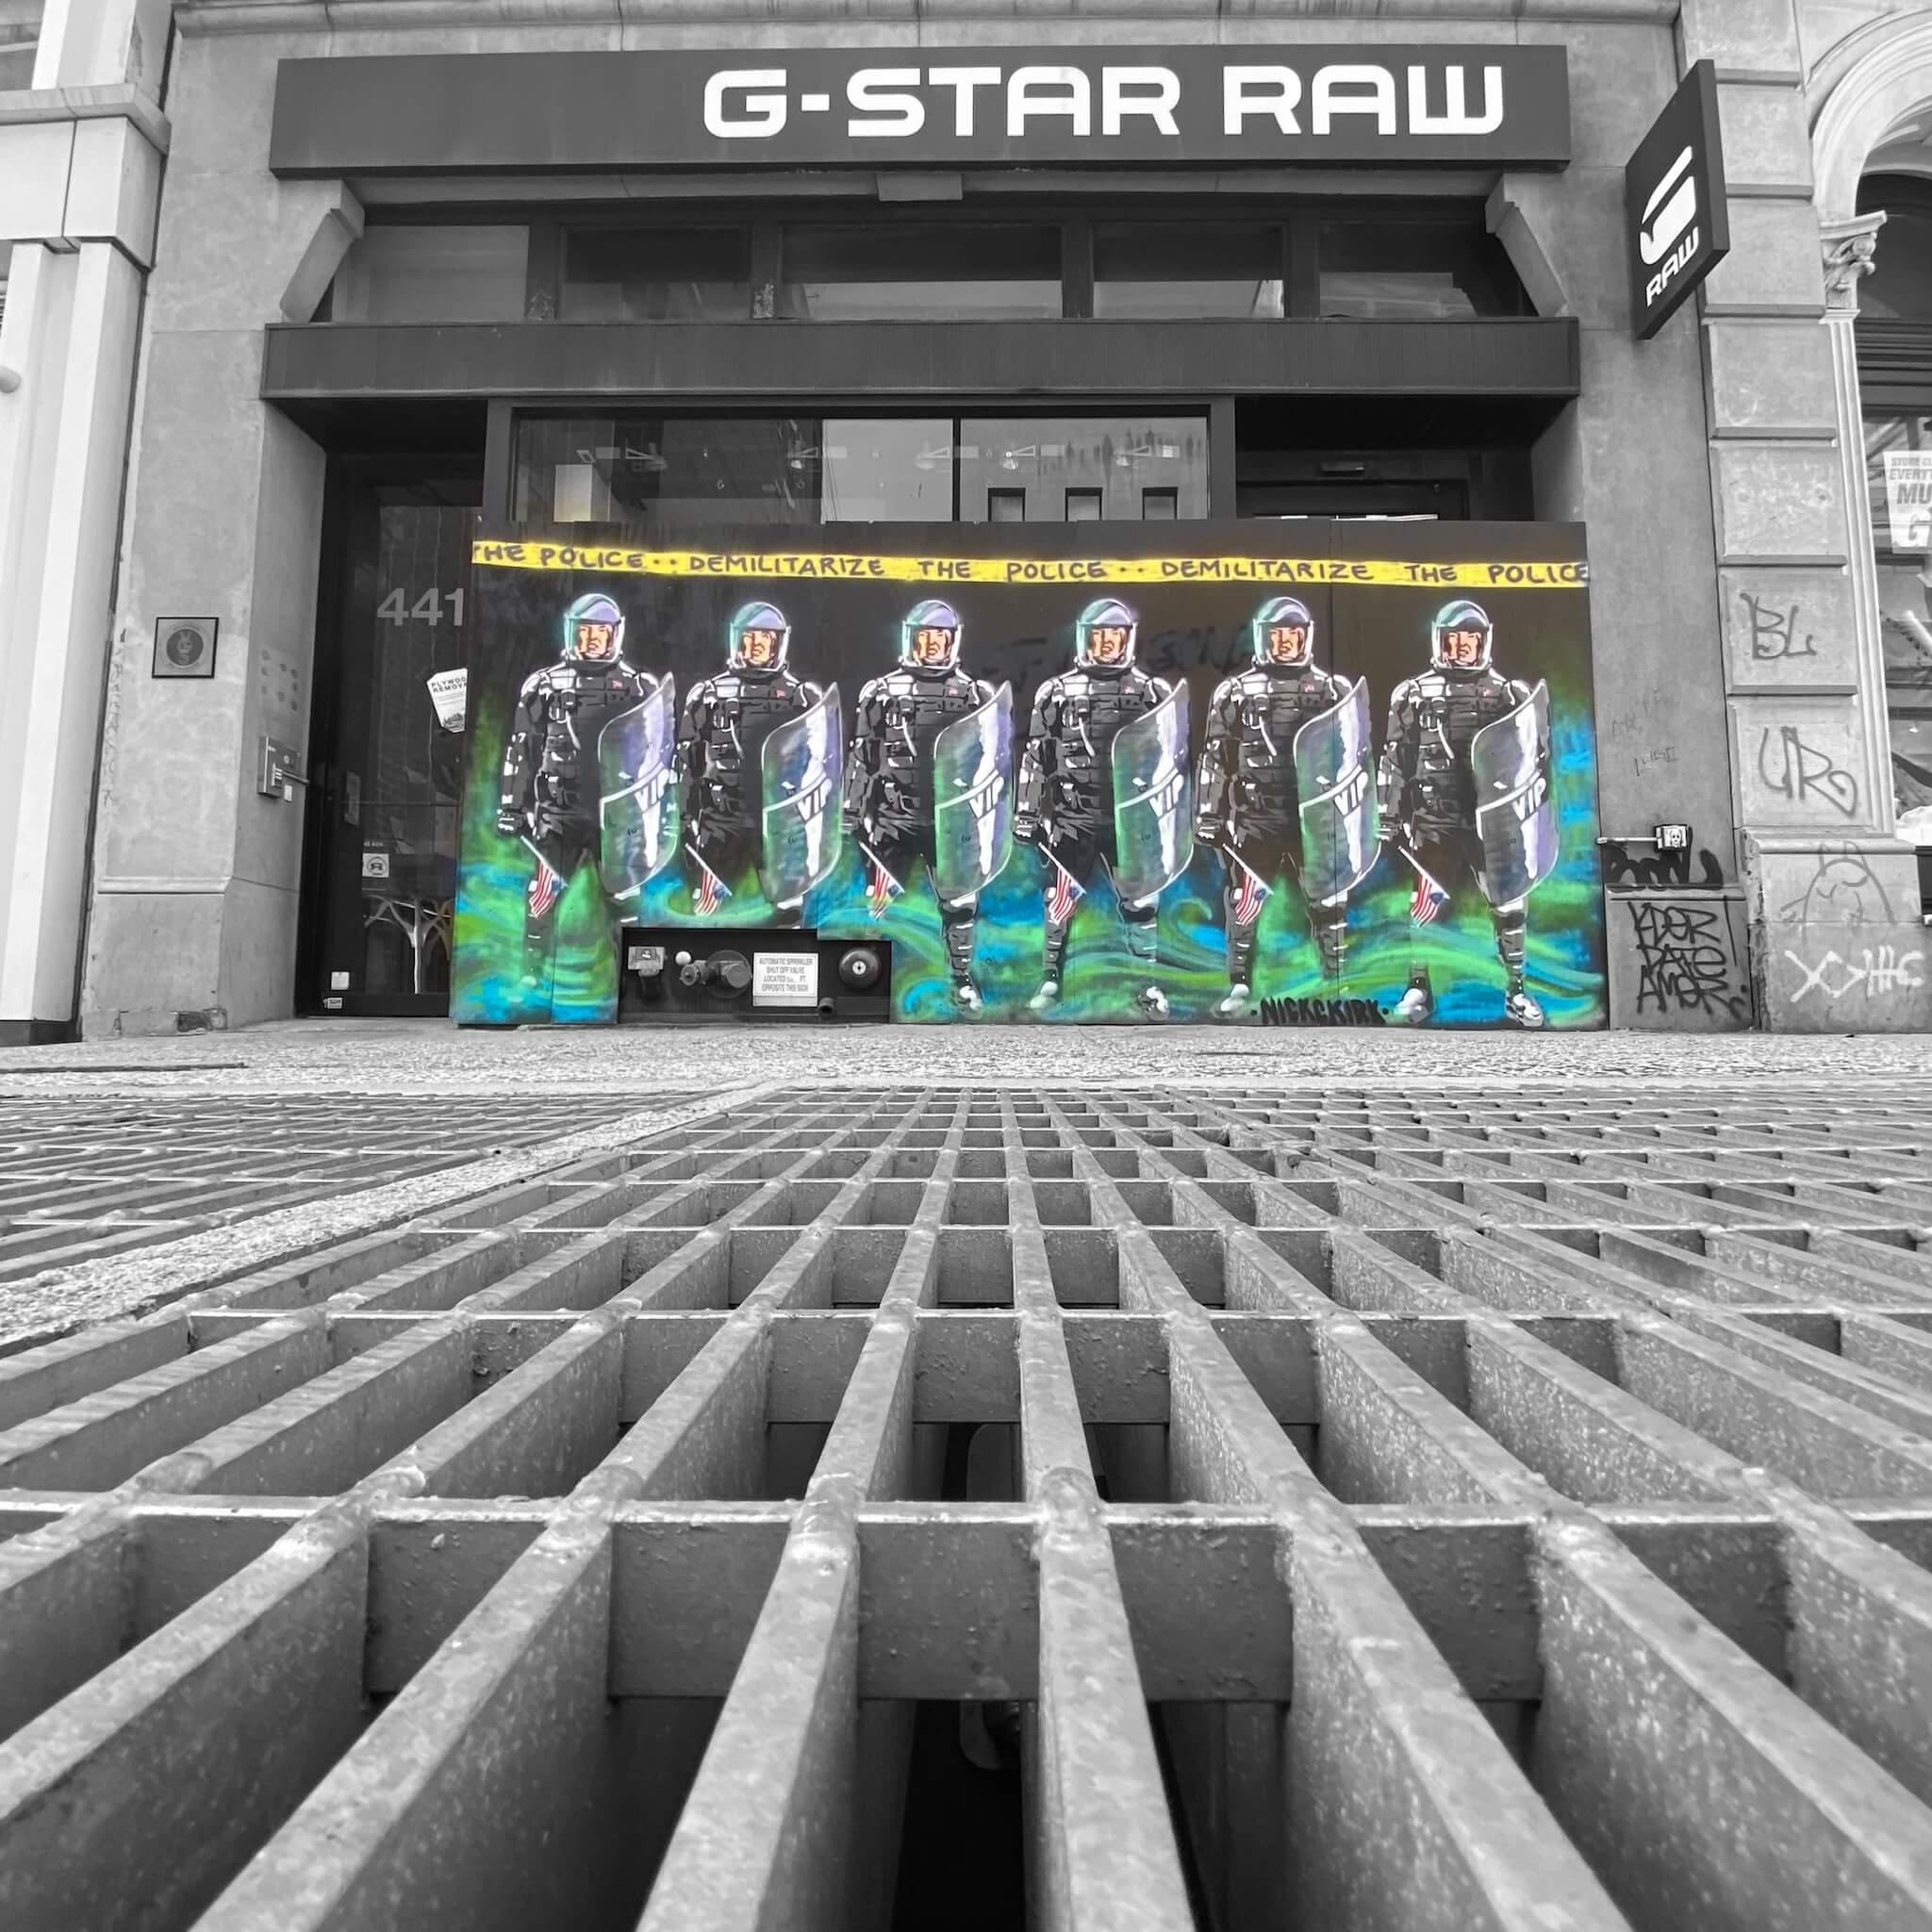 G-Star Raw - Street Art Photography by Sarah Sansom